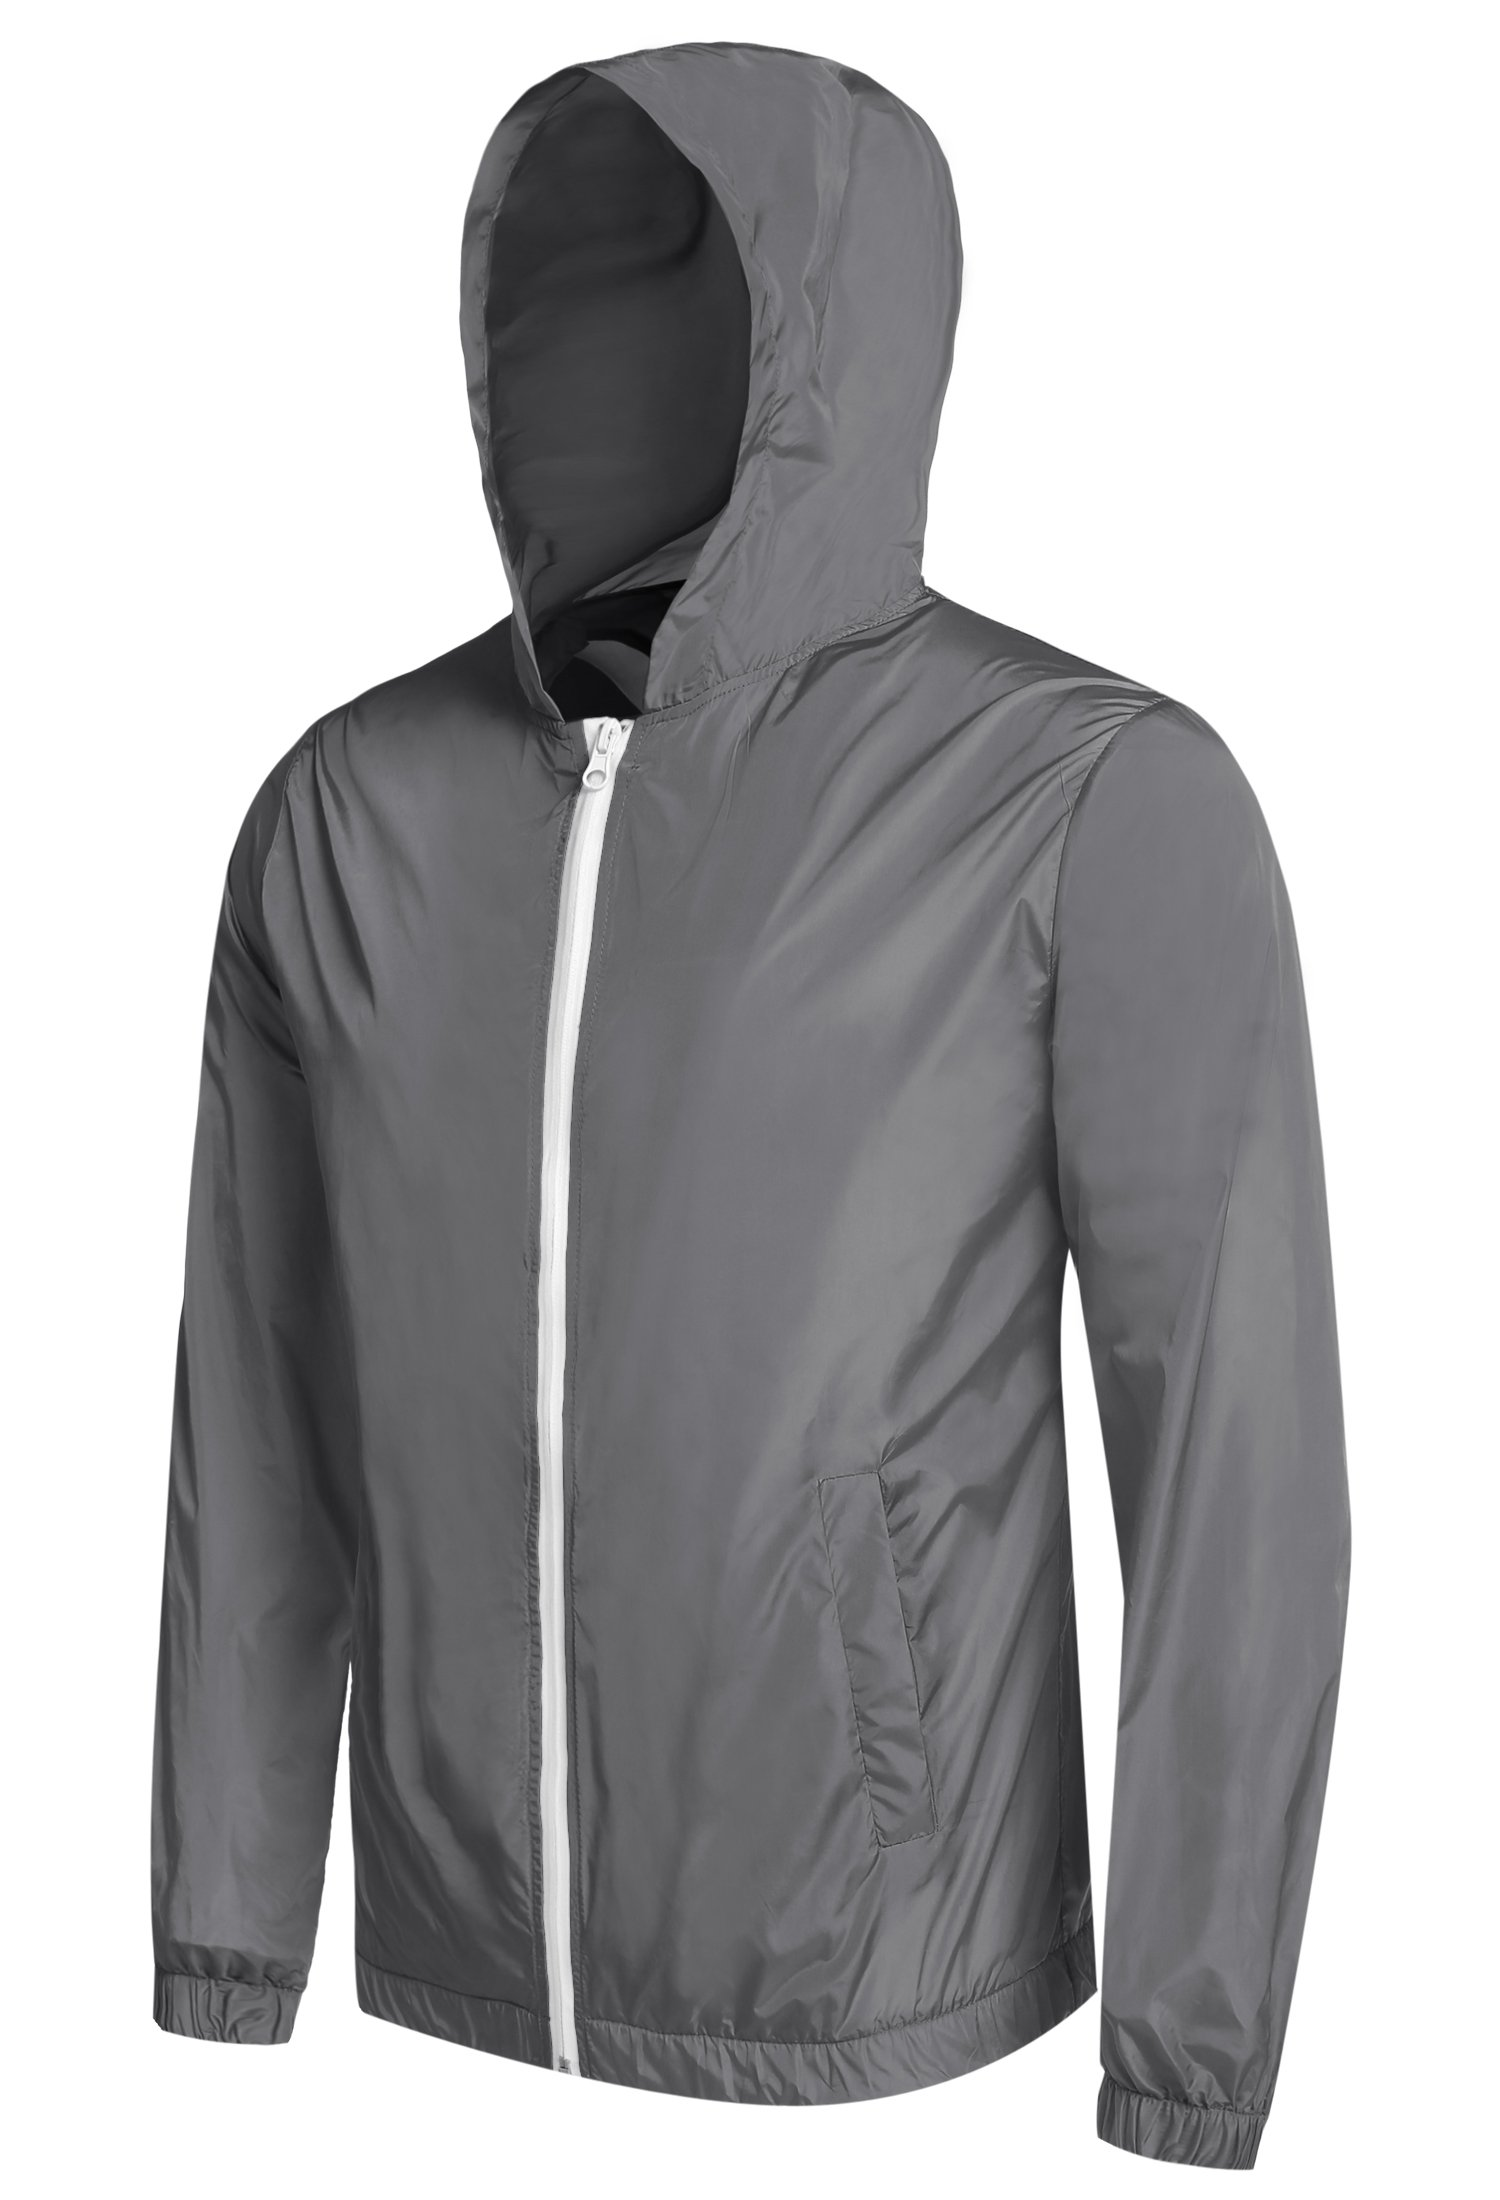 Detailorpin Men's Waterproof Rain Jacket Lightweight Hooded Outdoor Running Cycling Packable Raincoat